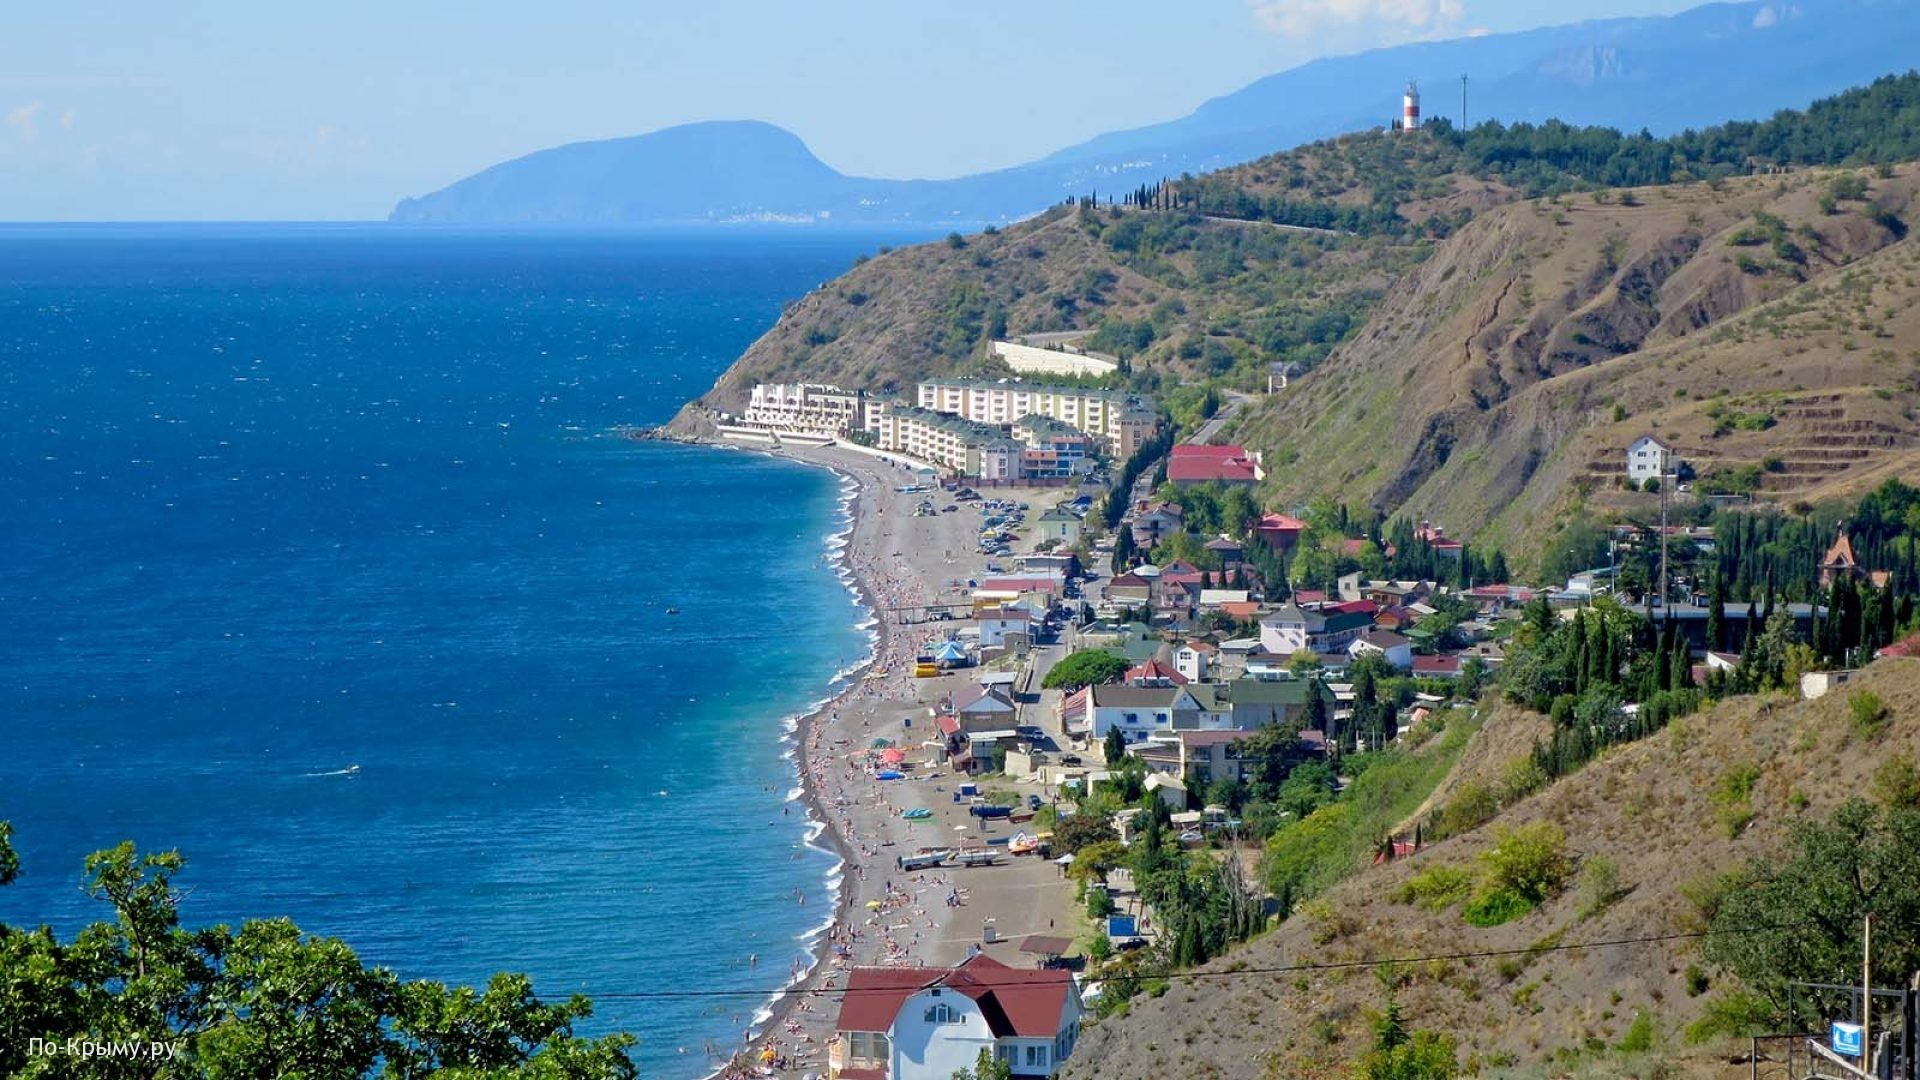 Курортный поселок на Южном берегу Крыма